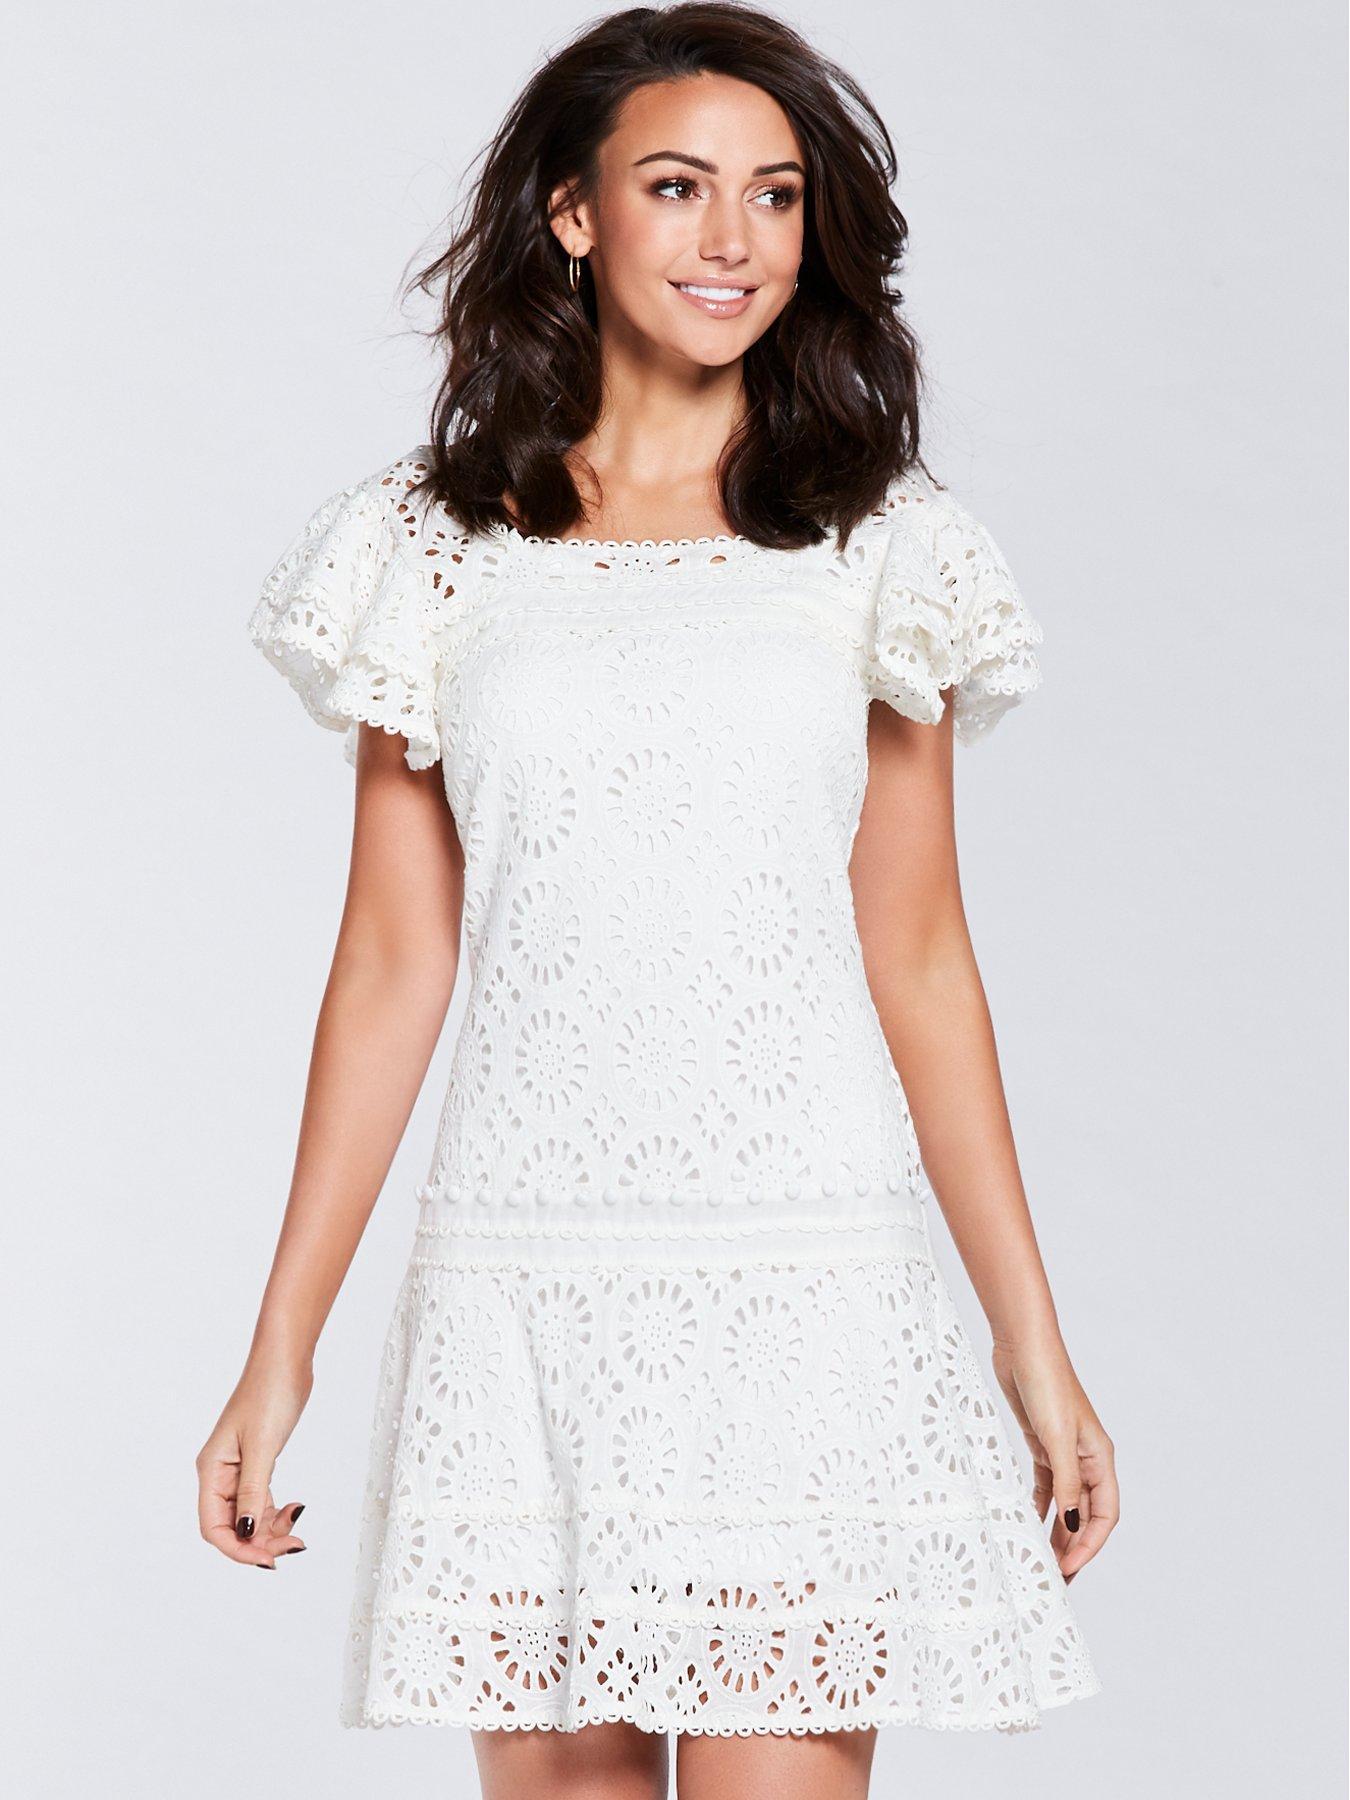 White Dress Clearance